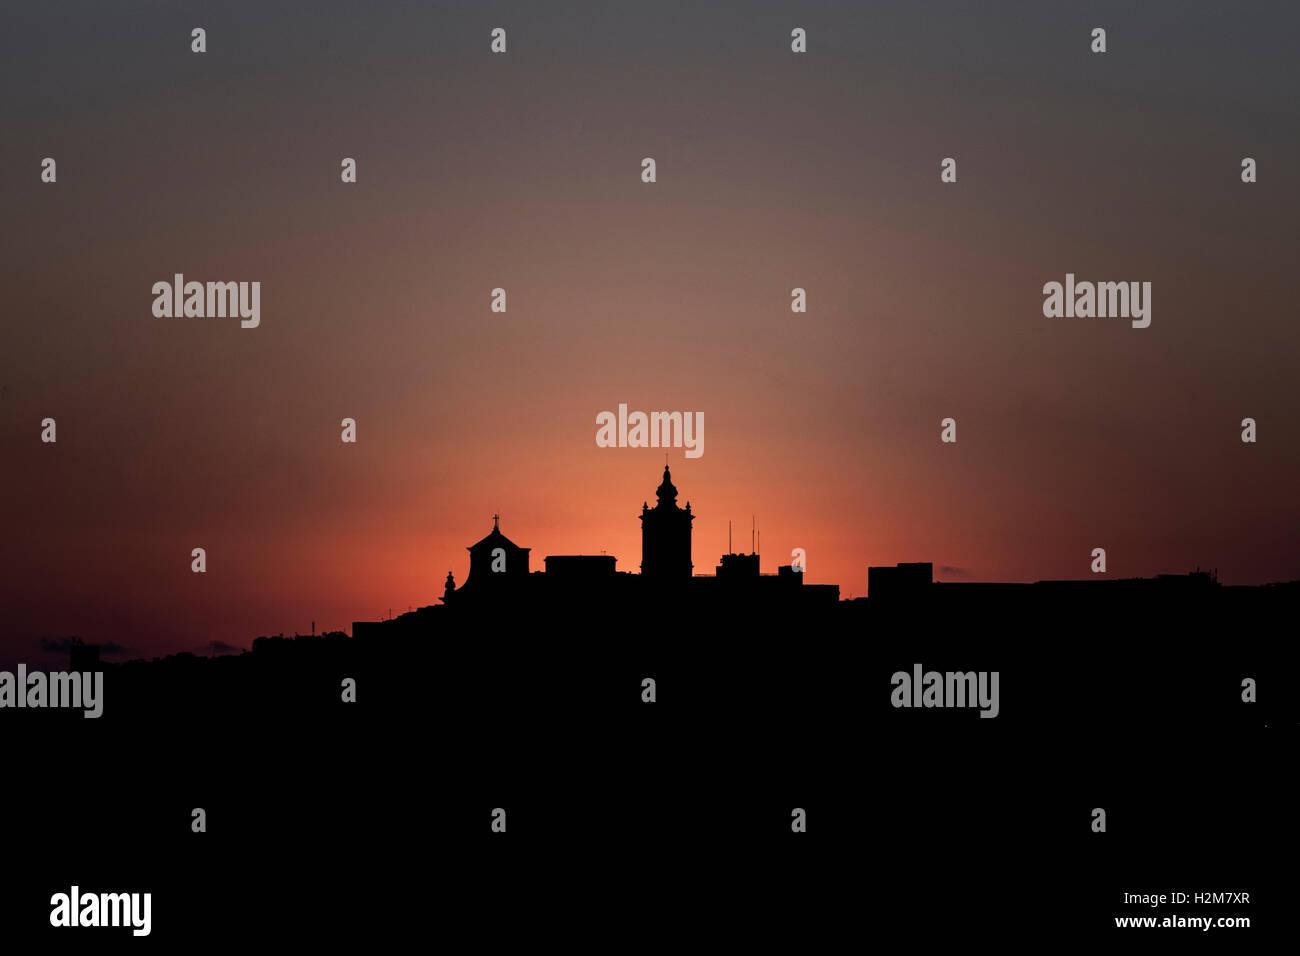 Silueta de la Cittadella, Victoria, Gozo, Malta Imagen De Stock